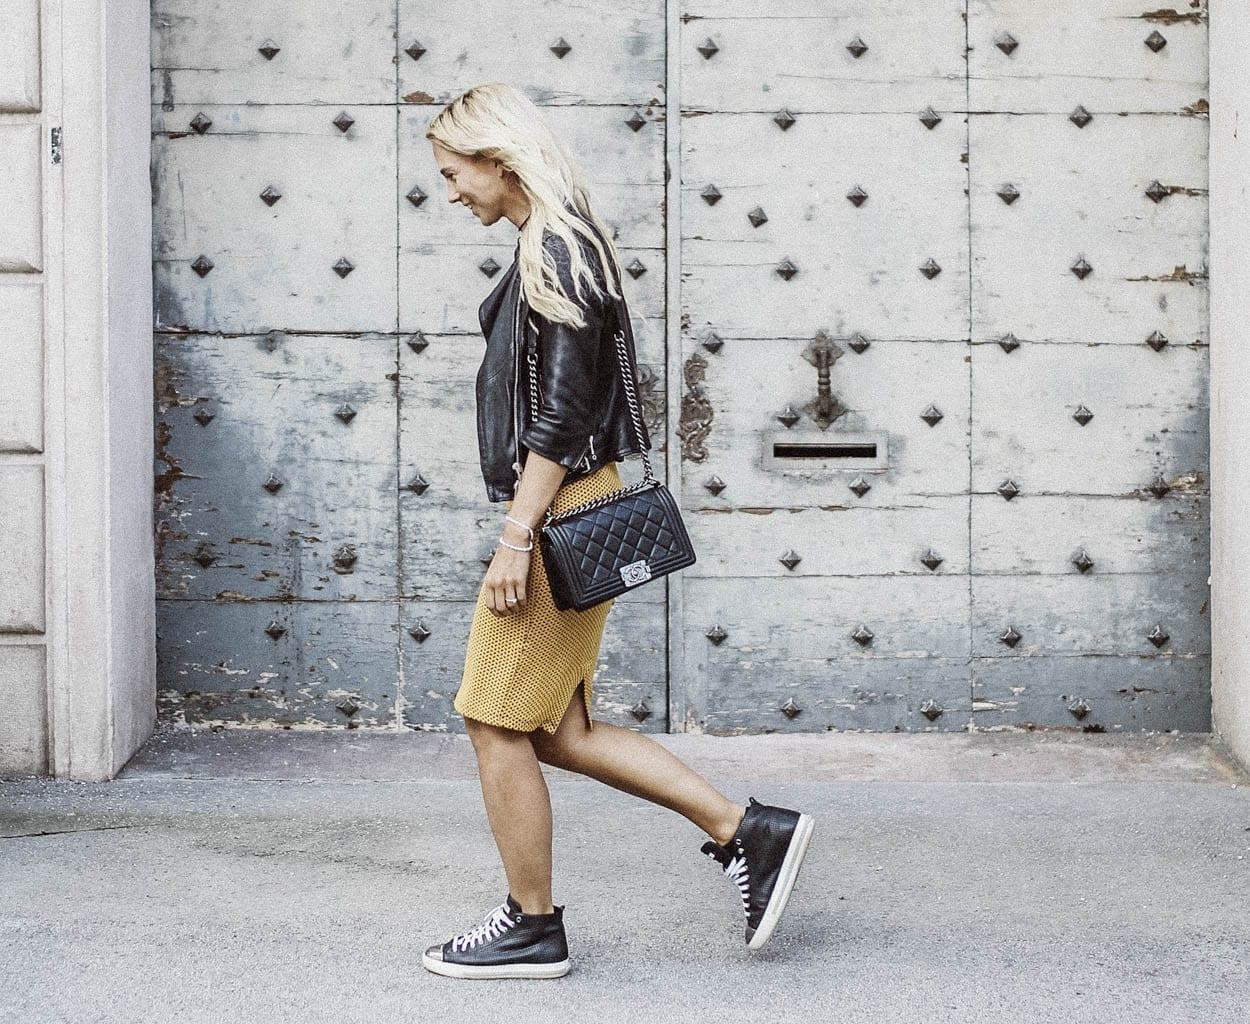 CK-Constantlly-K-Fashion-Street-Style-Blog-Rieger-Fashion-Salzburg-constantlyk.com-1843